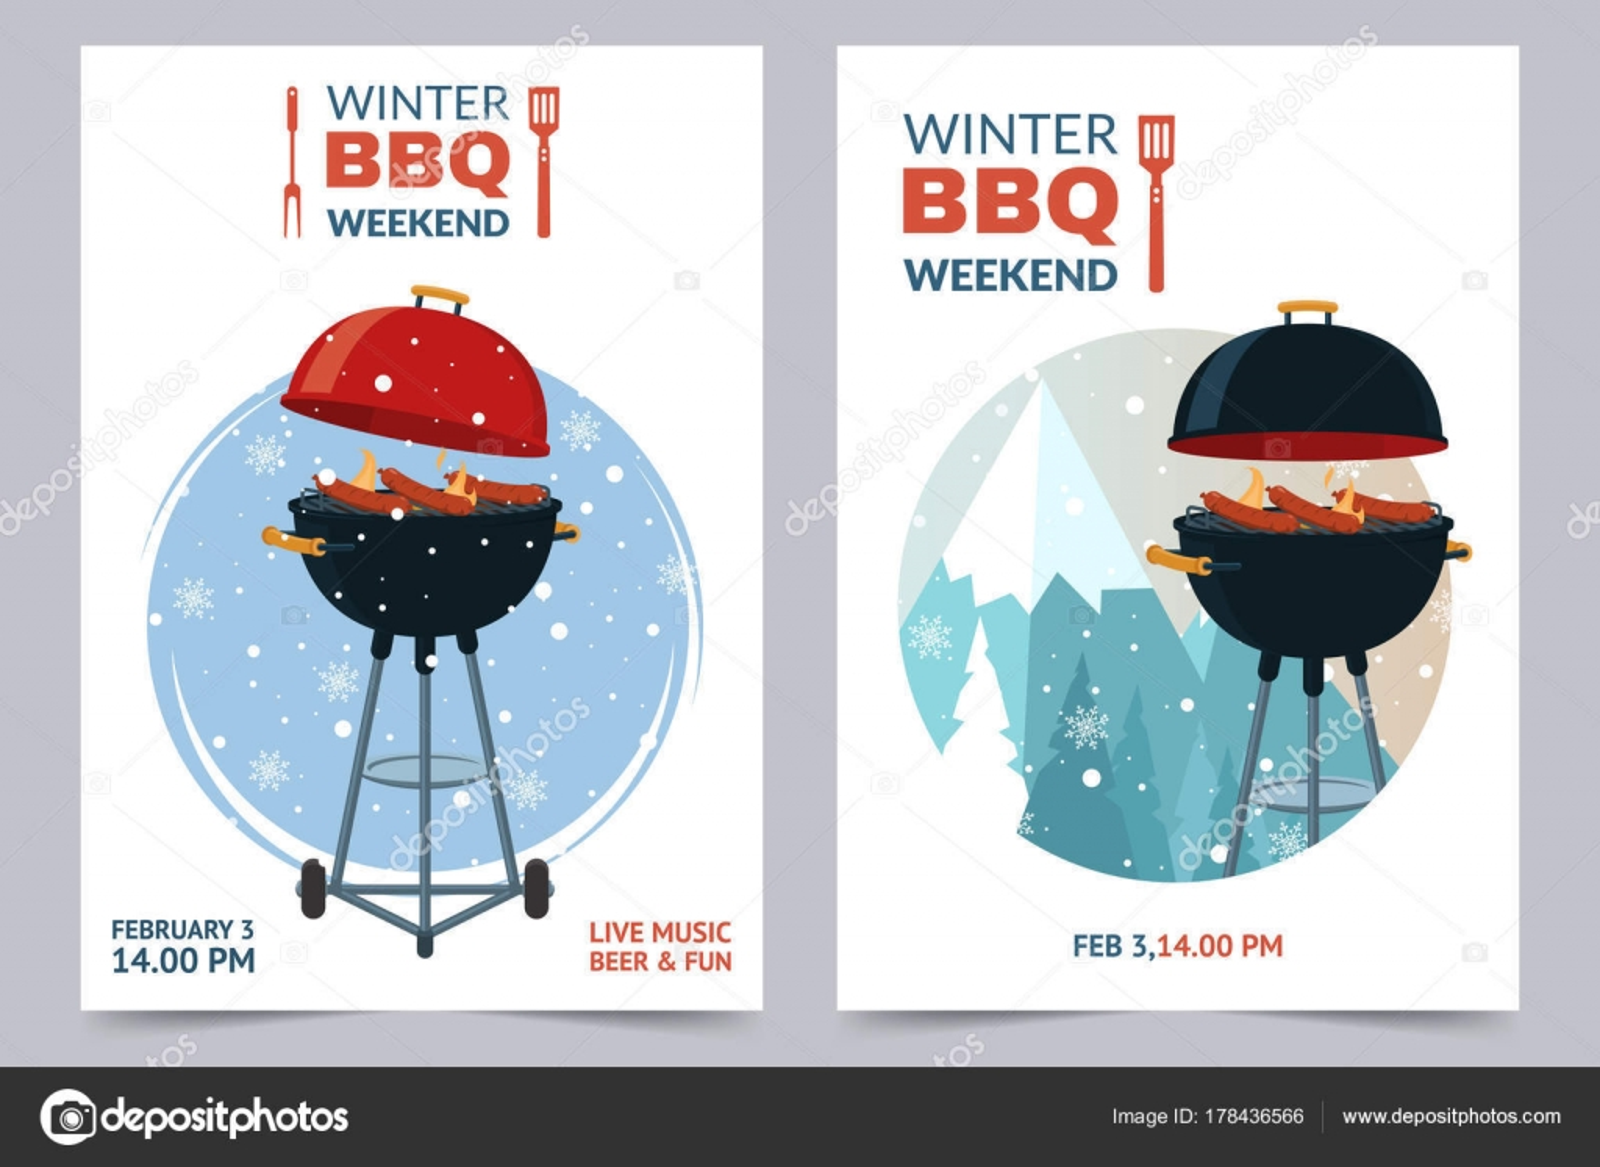 Winter bbq party a4 invitation template barbecue weekend flyer winter bbq party a4 invitation template barbecue weekend flyer grill illustration on snowy backdrop stopboris Choice Image